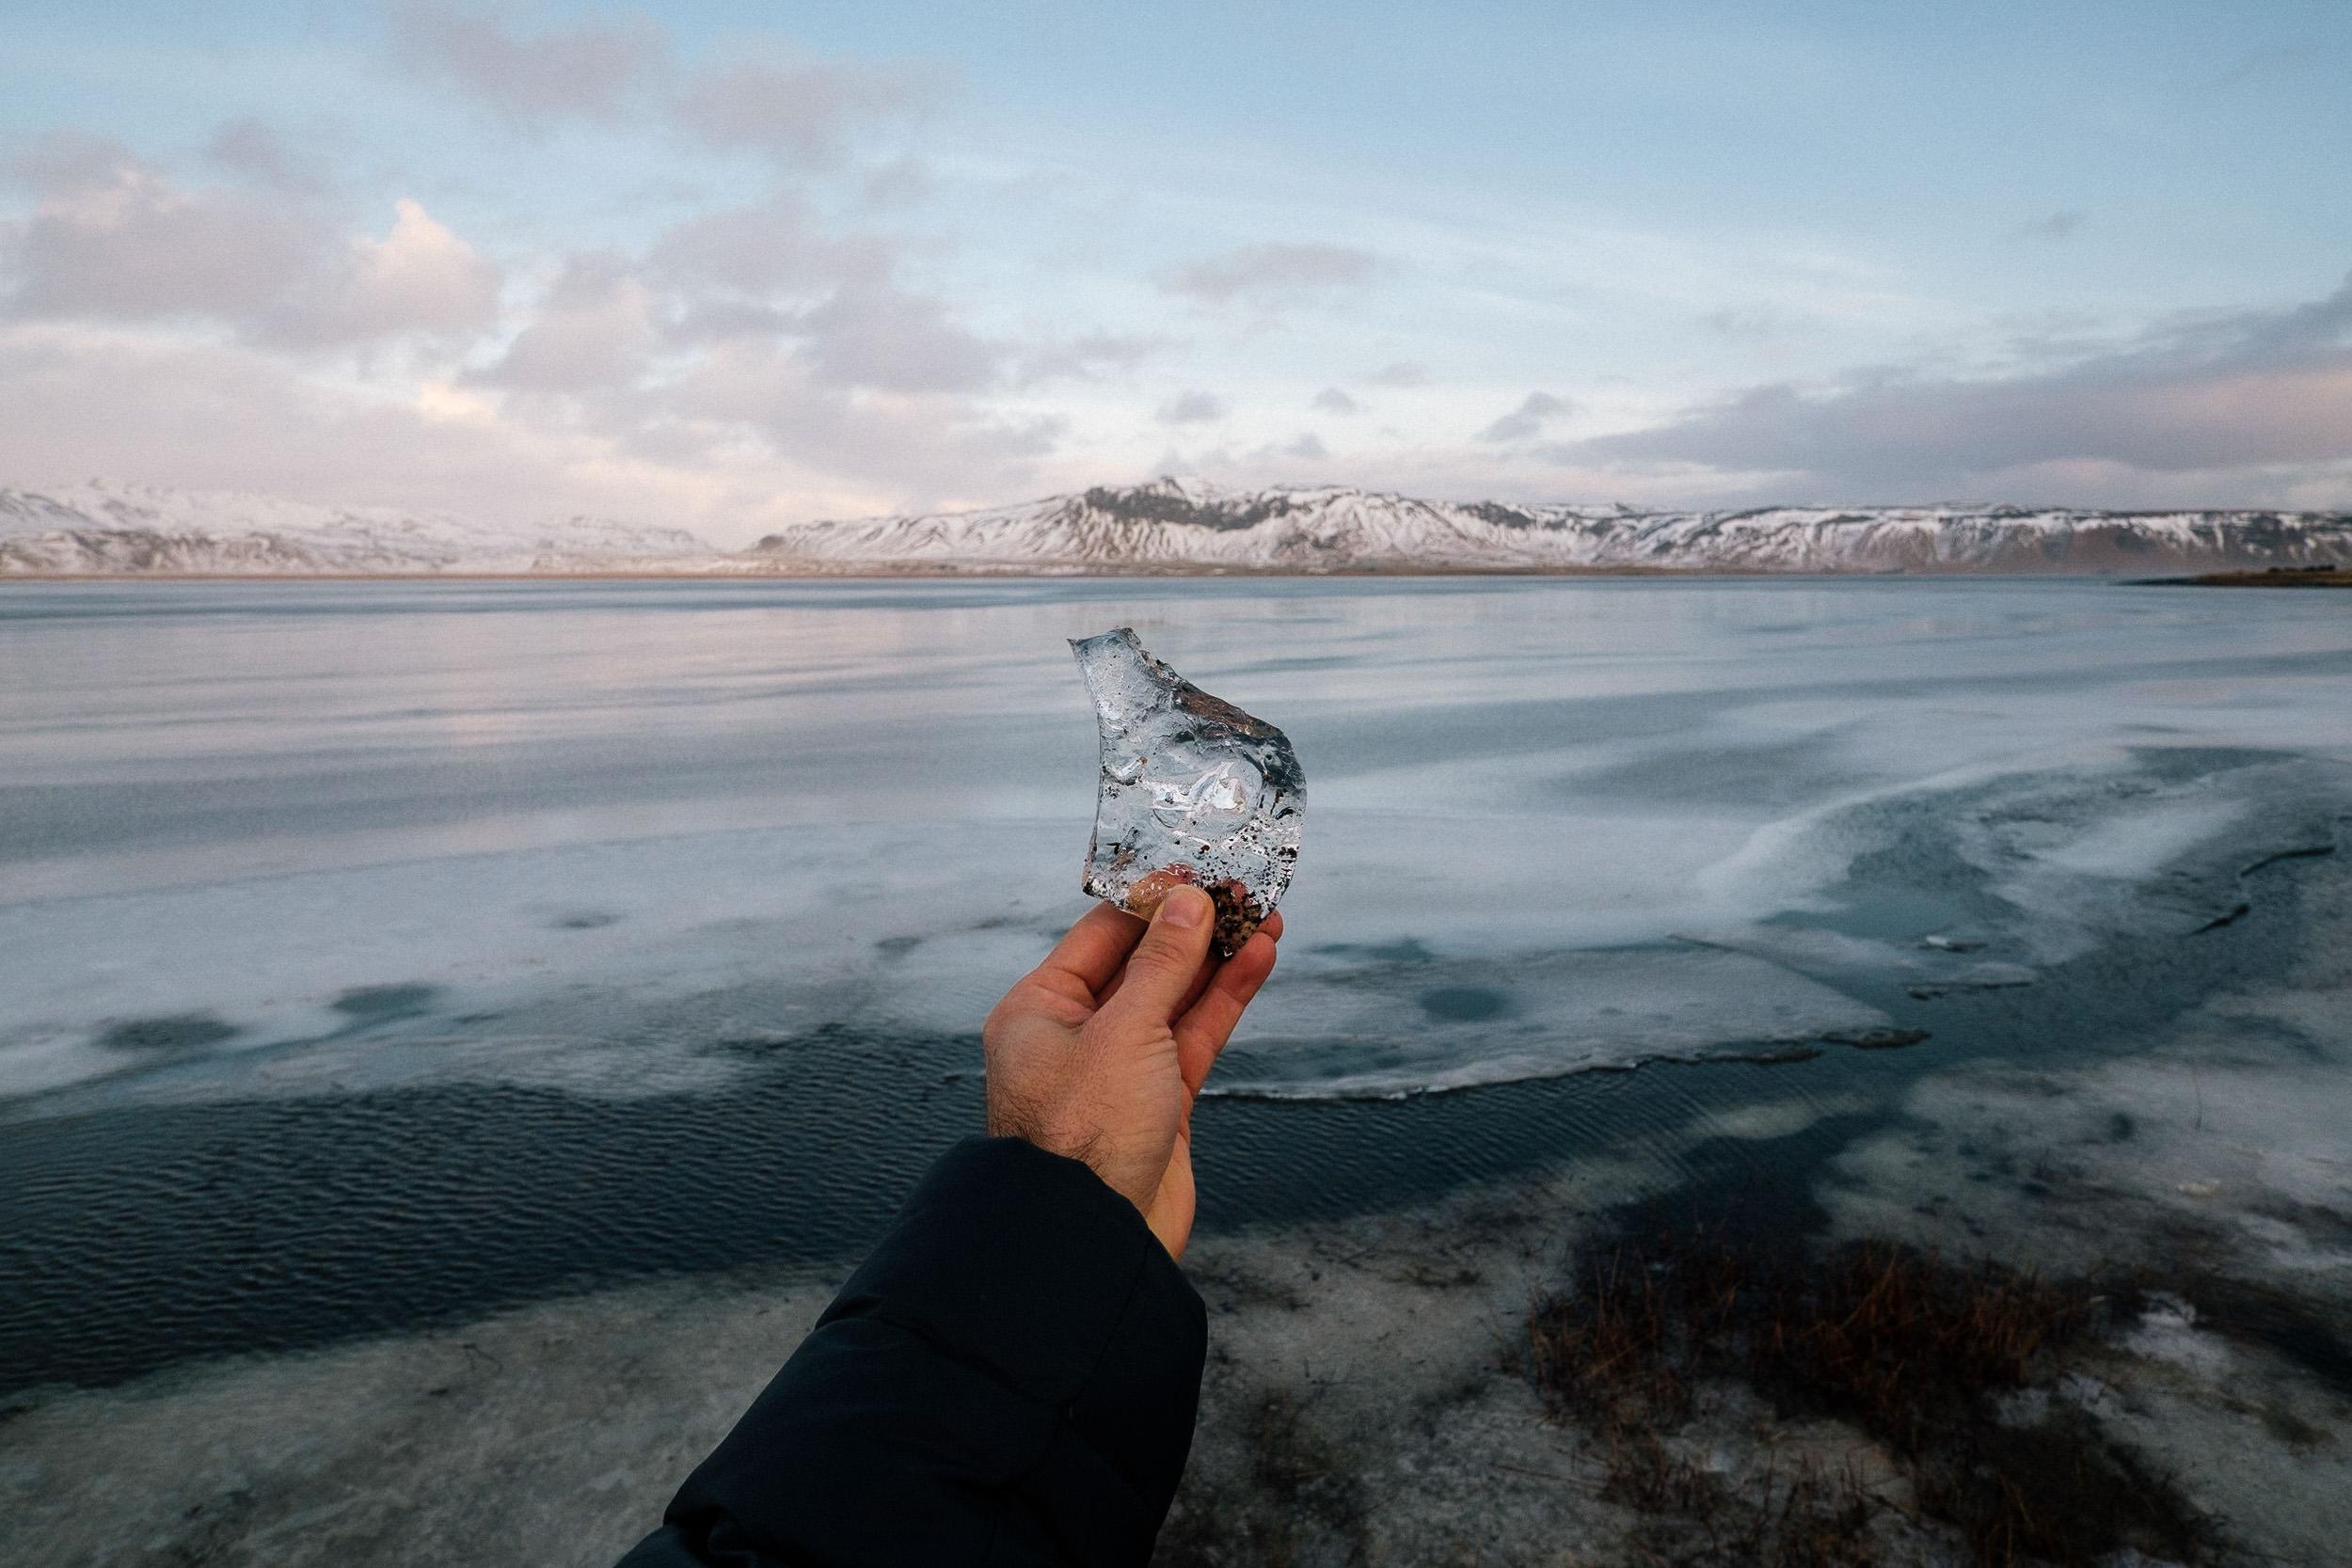 Collective_Wander_Iceland_Photographers_Trip_070.jpg